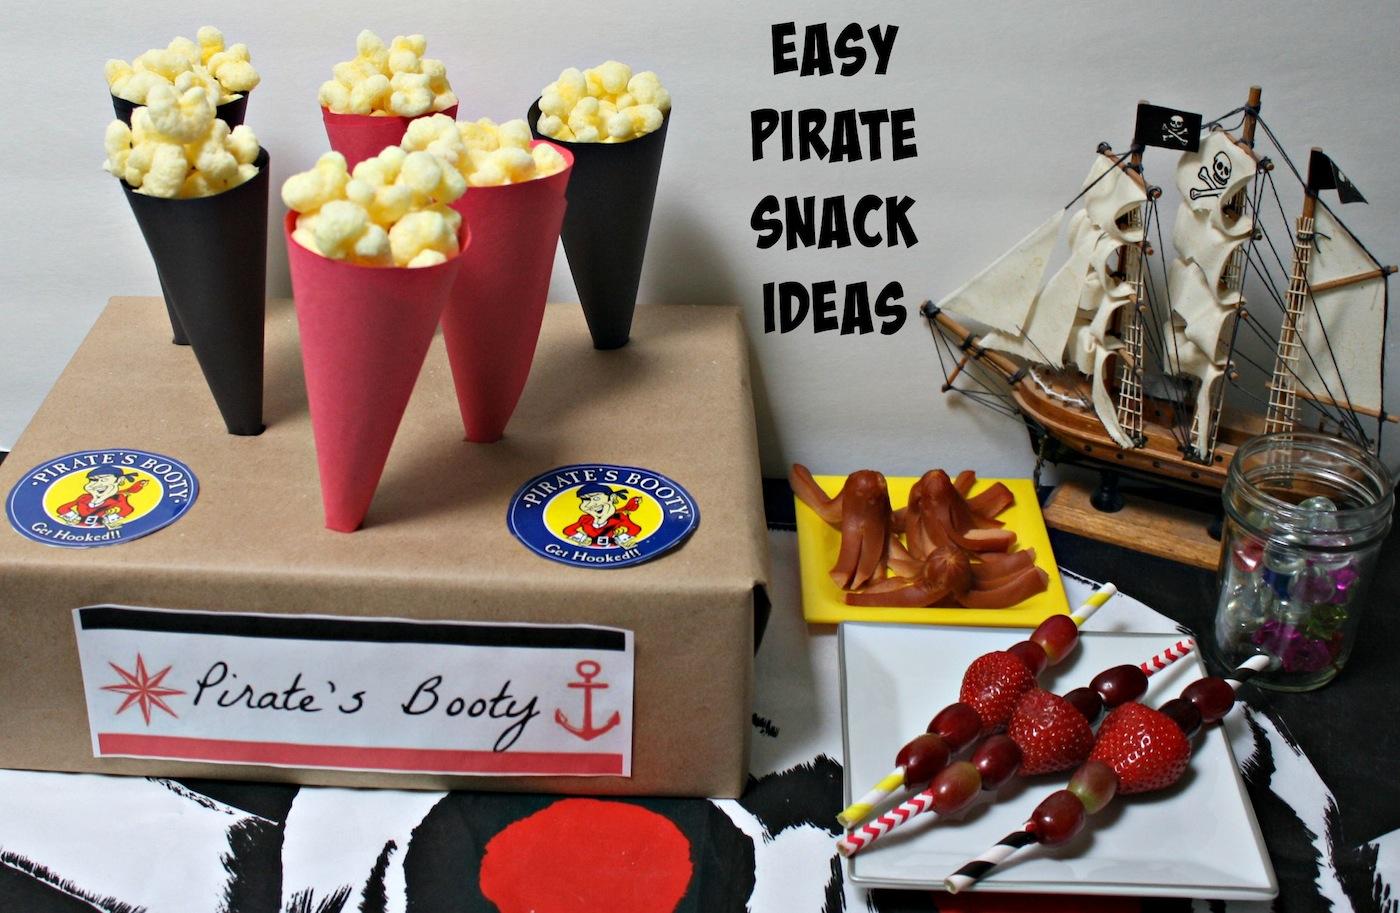 Easy Pirate Snack Ideas